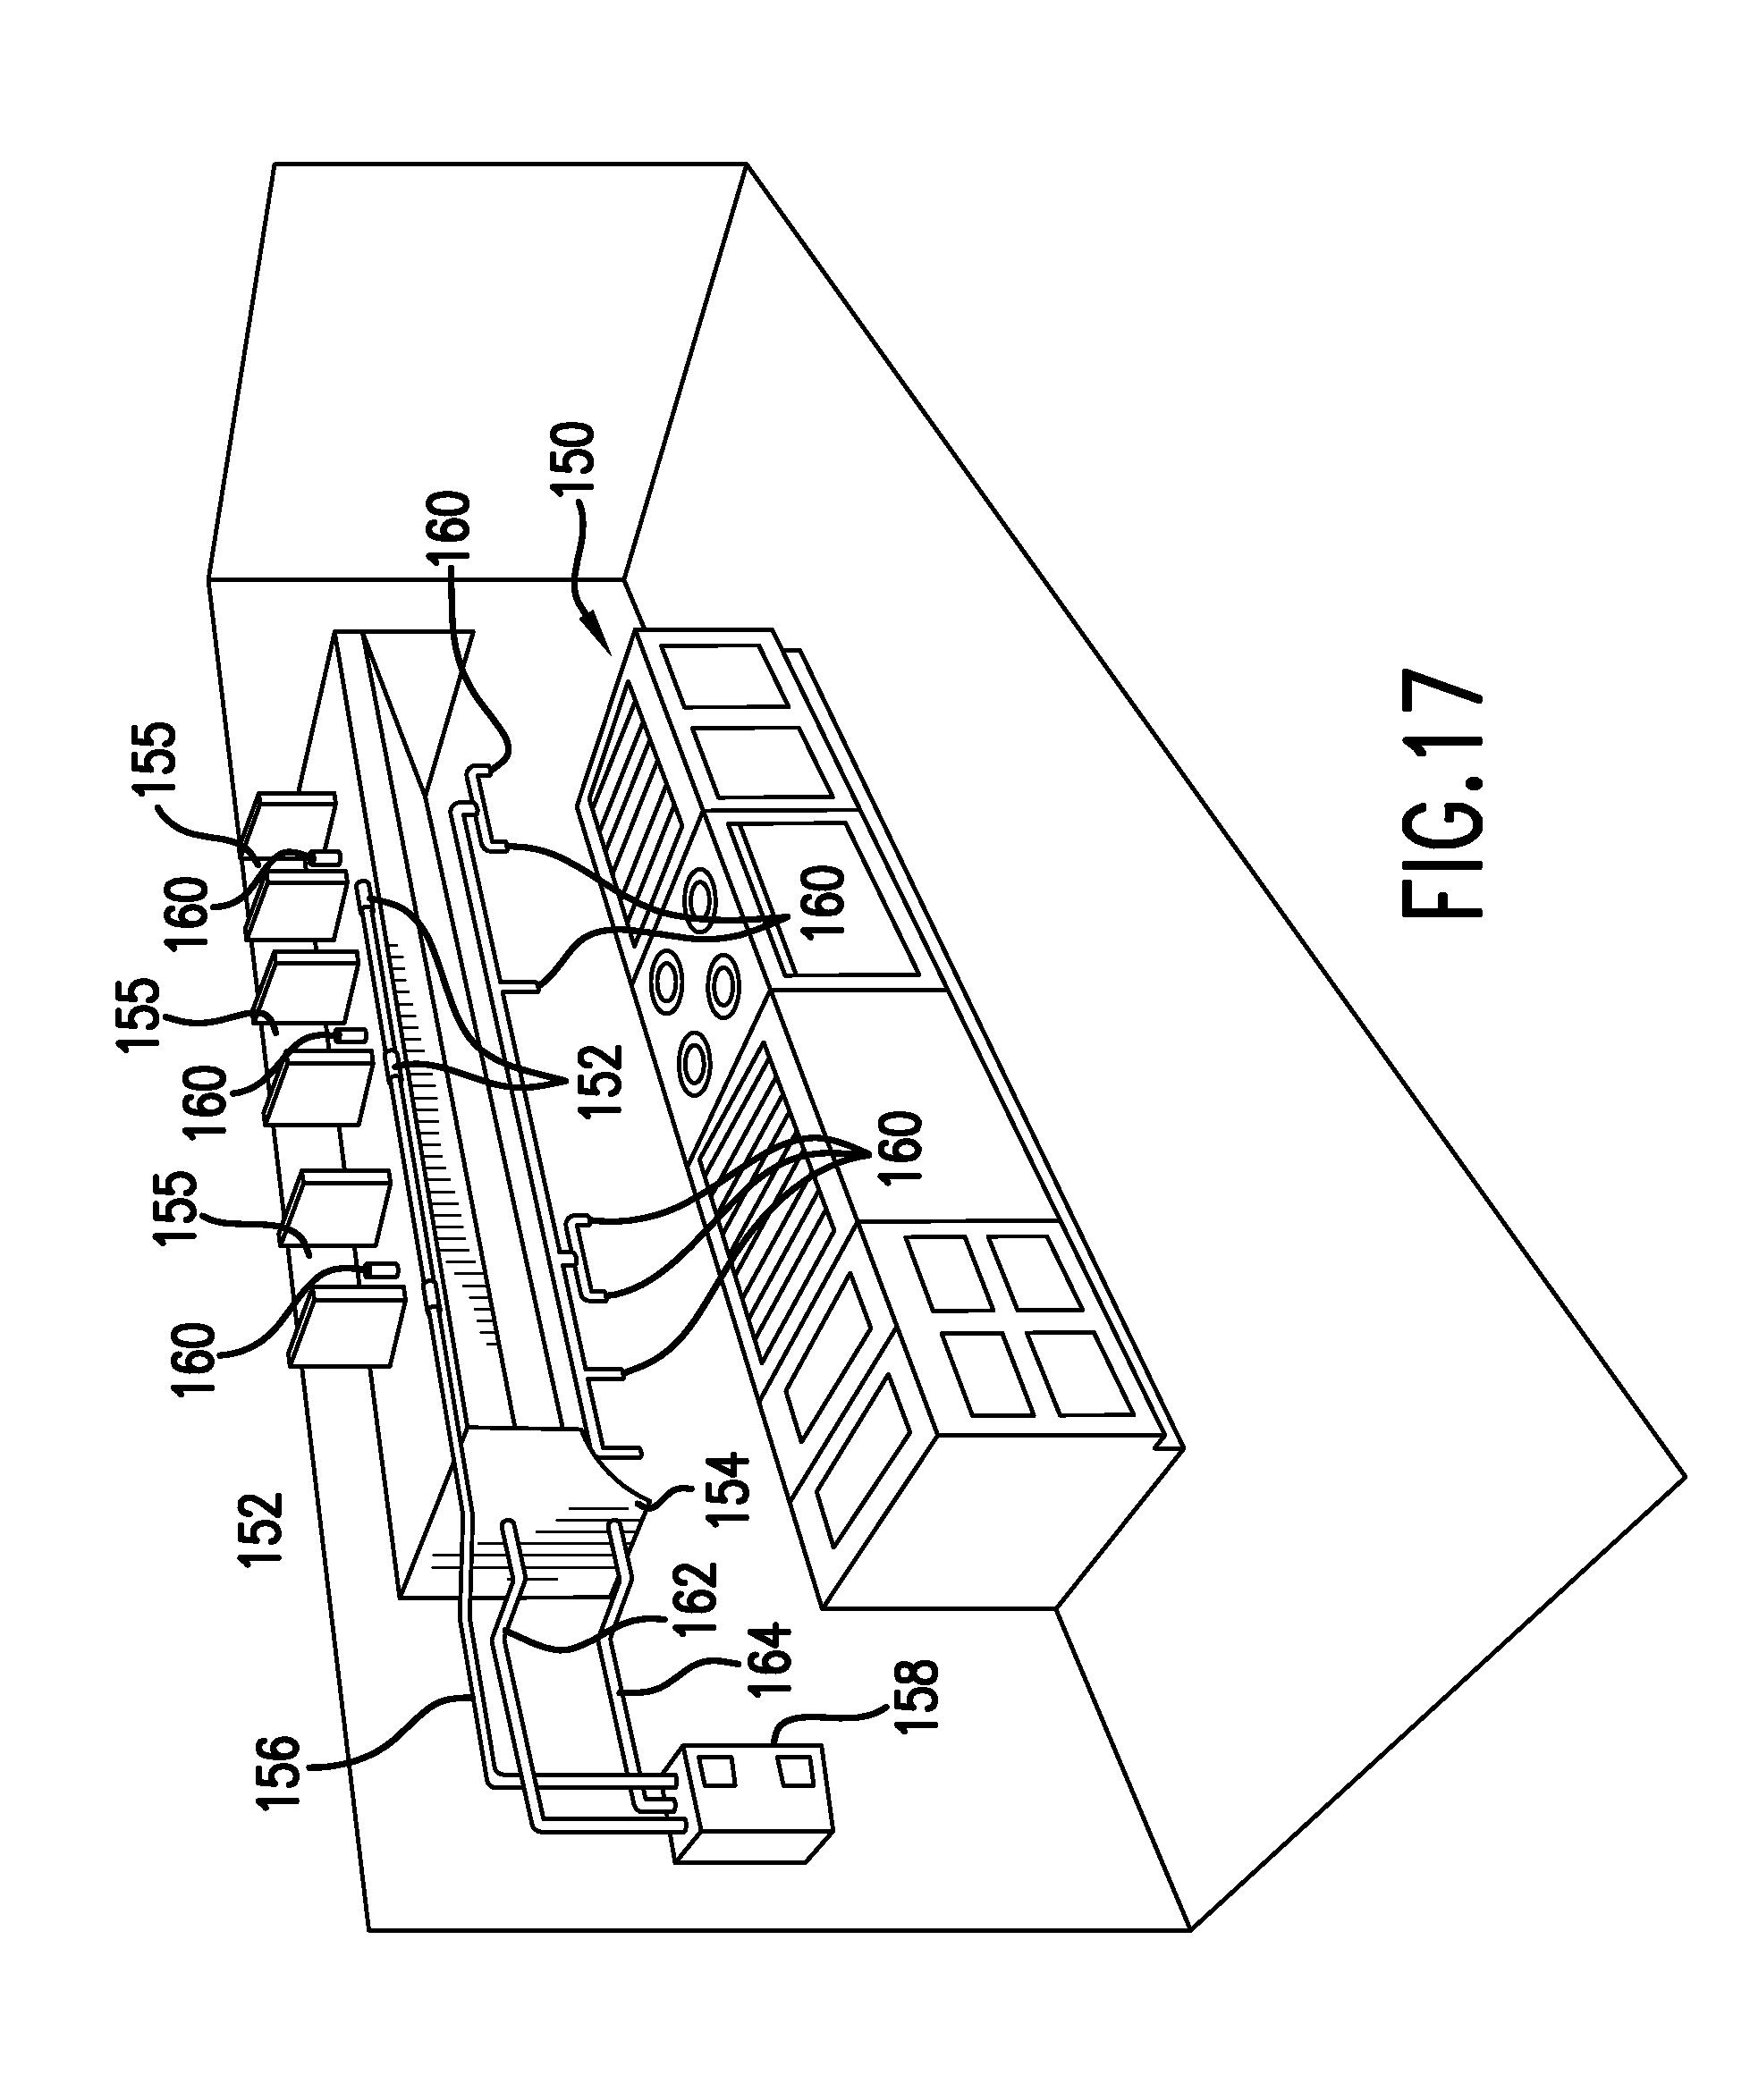 emerson electric motors wiring diagrams usb 3 0 wire diagram caterpillar wiring schematics